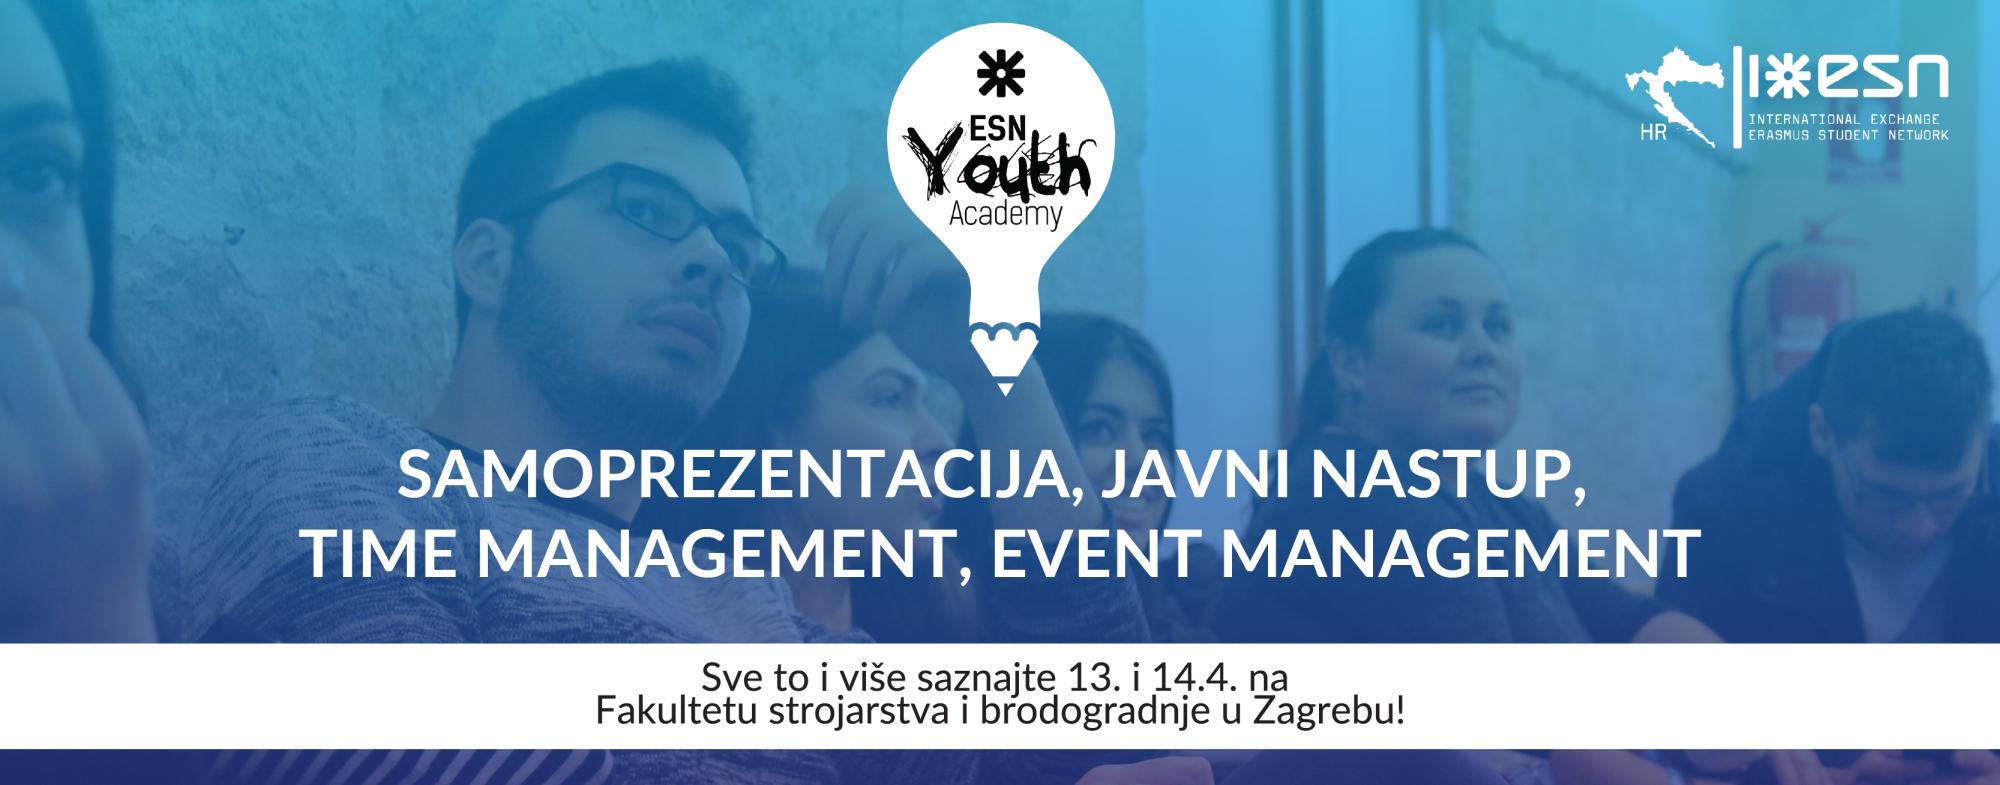 ESN Youth Academy u Zagrebu - Slika 1